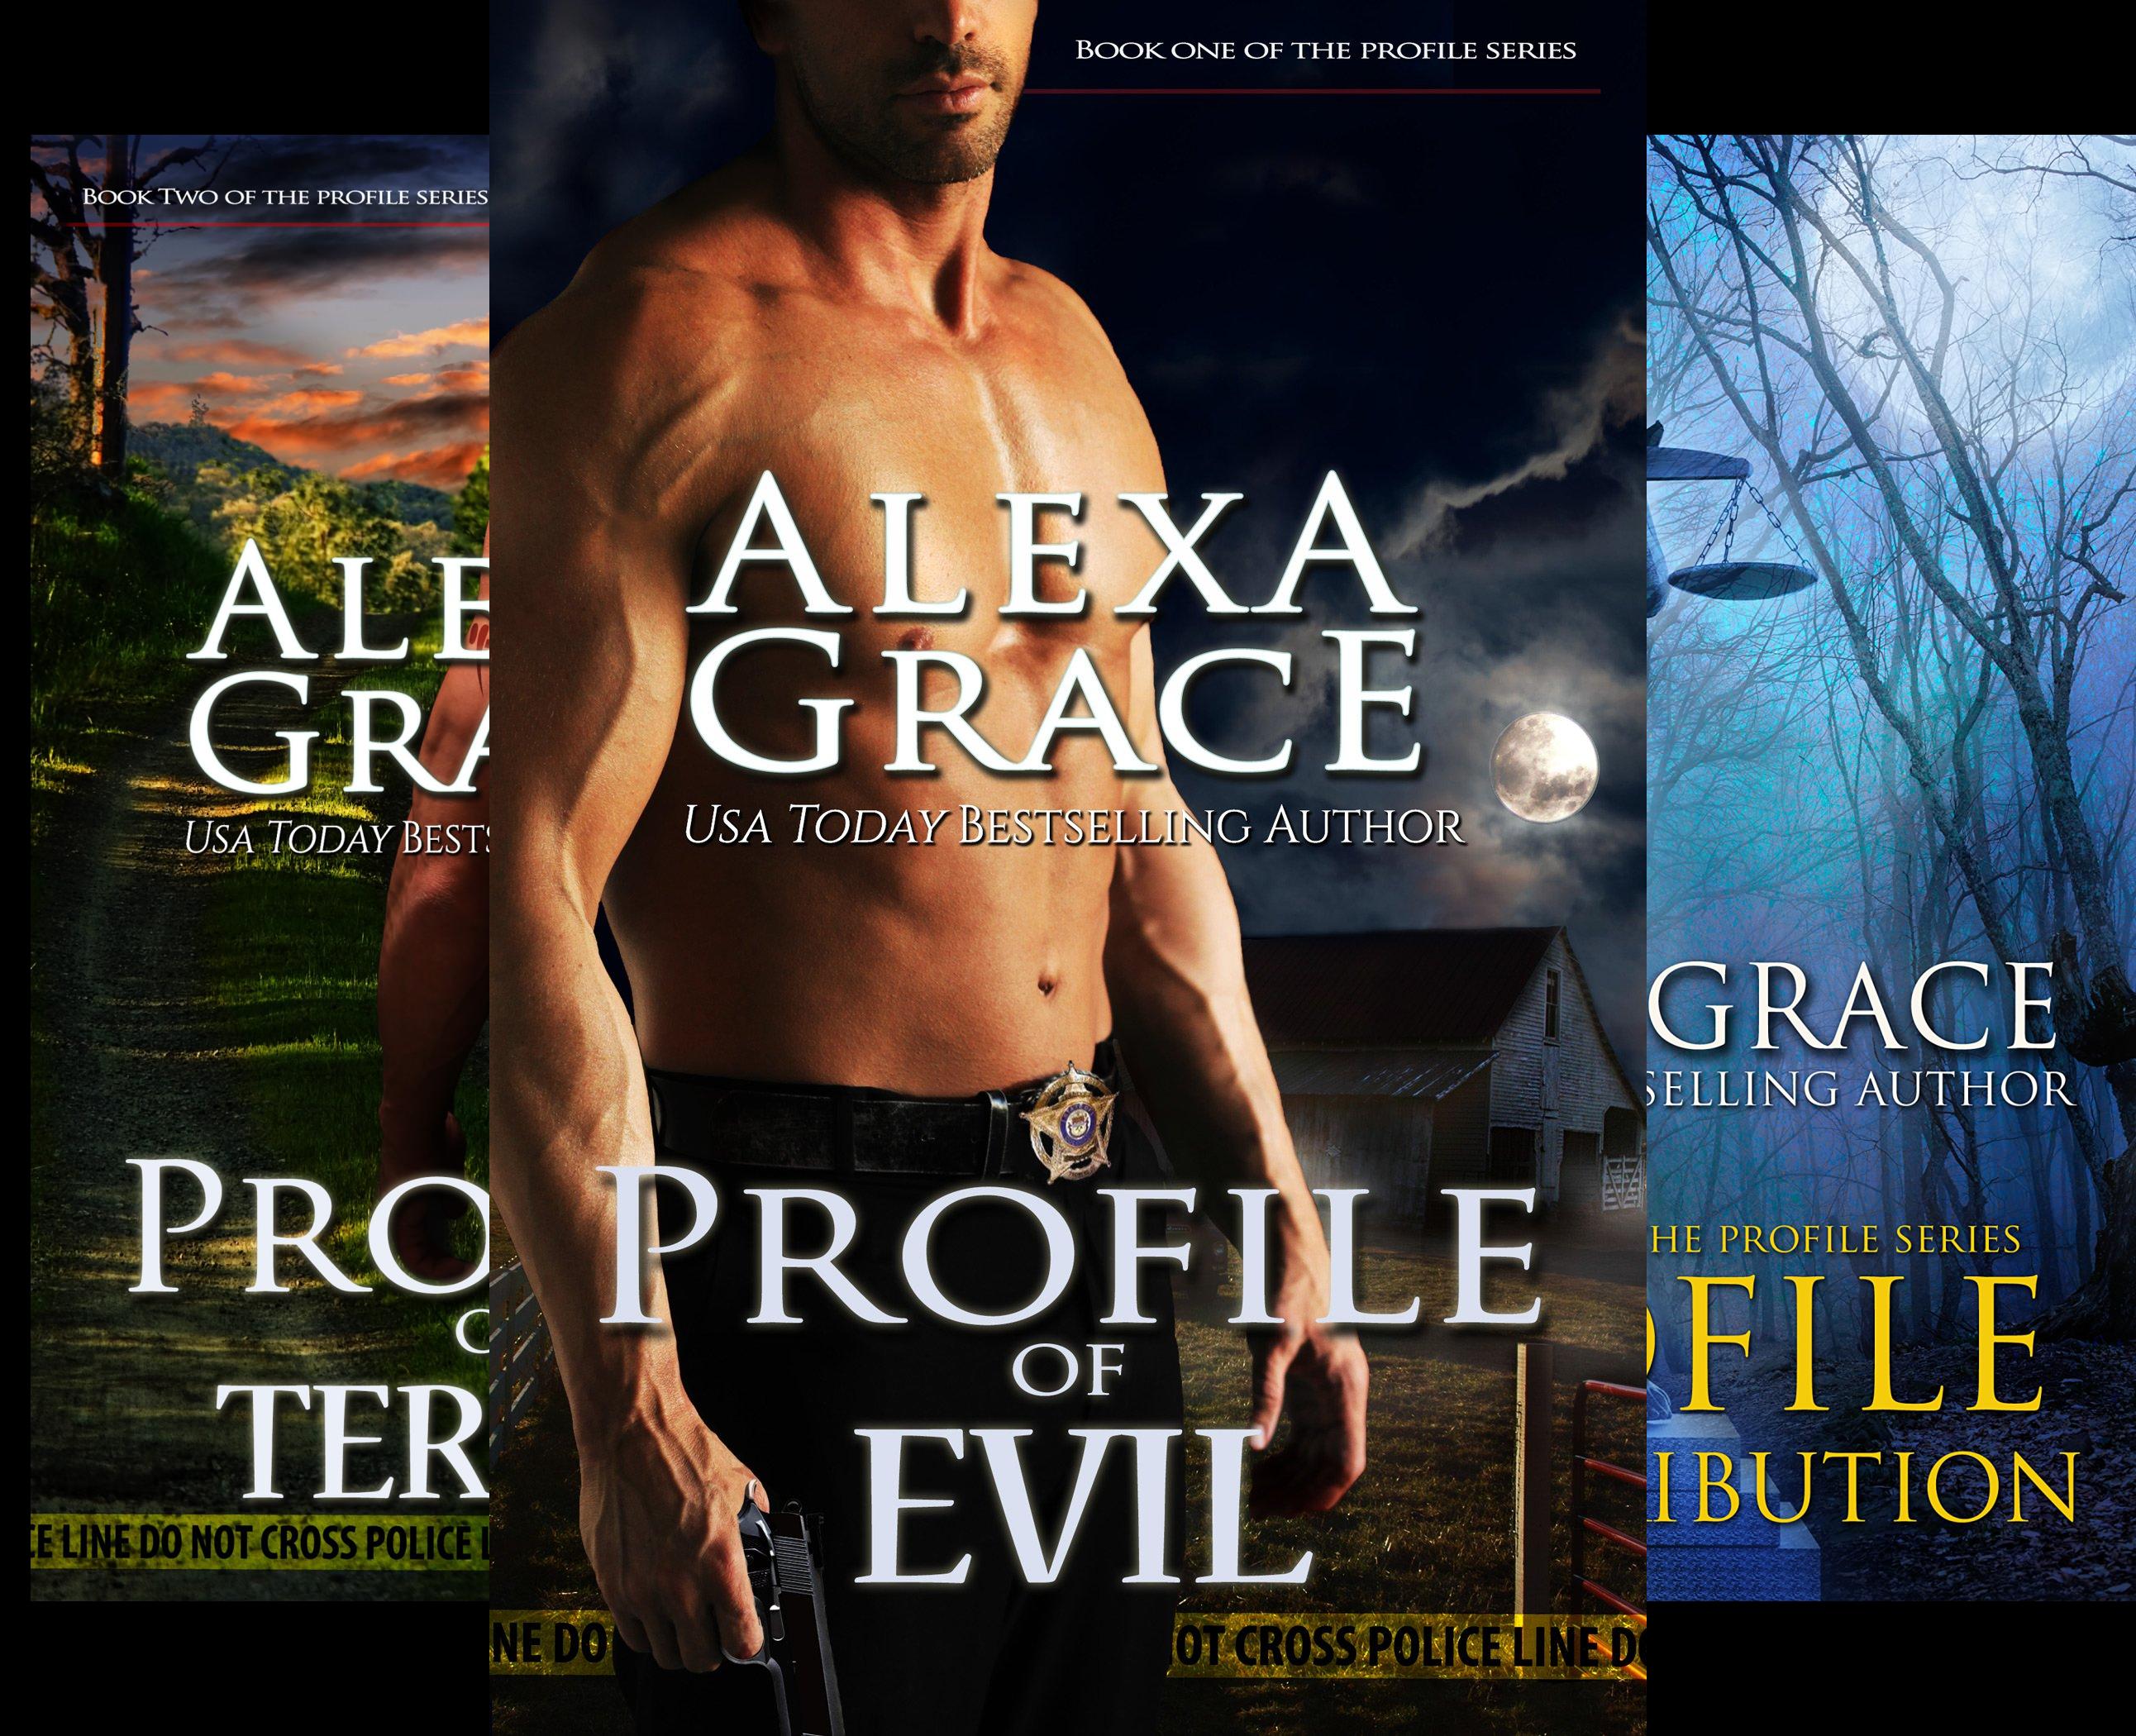 The 1 best alexa grace kindle books 2018